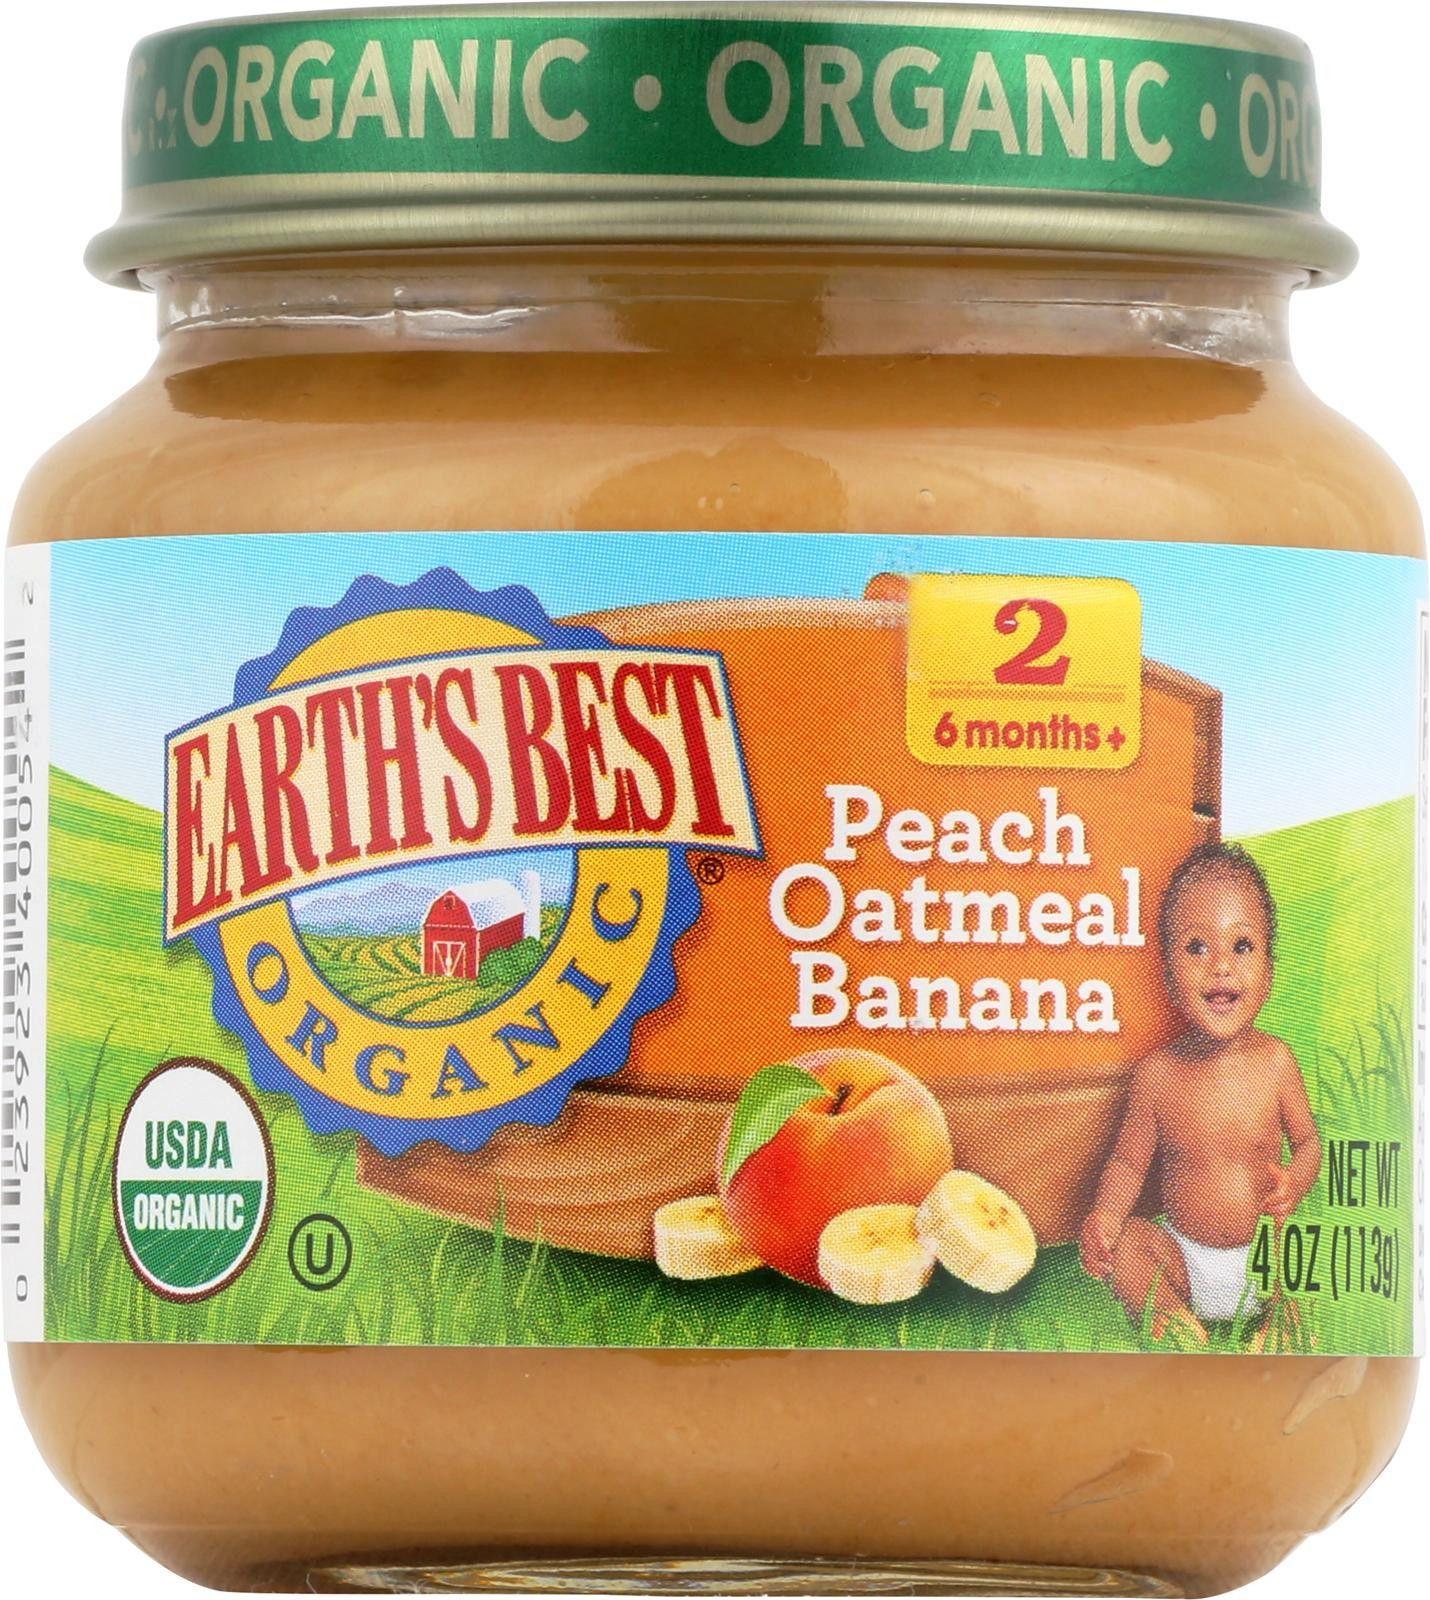 Earths best organic peach oatmeal banana baby food